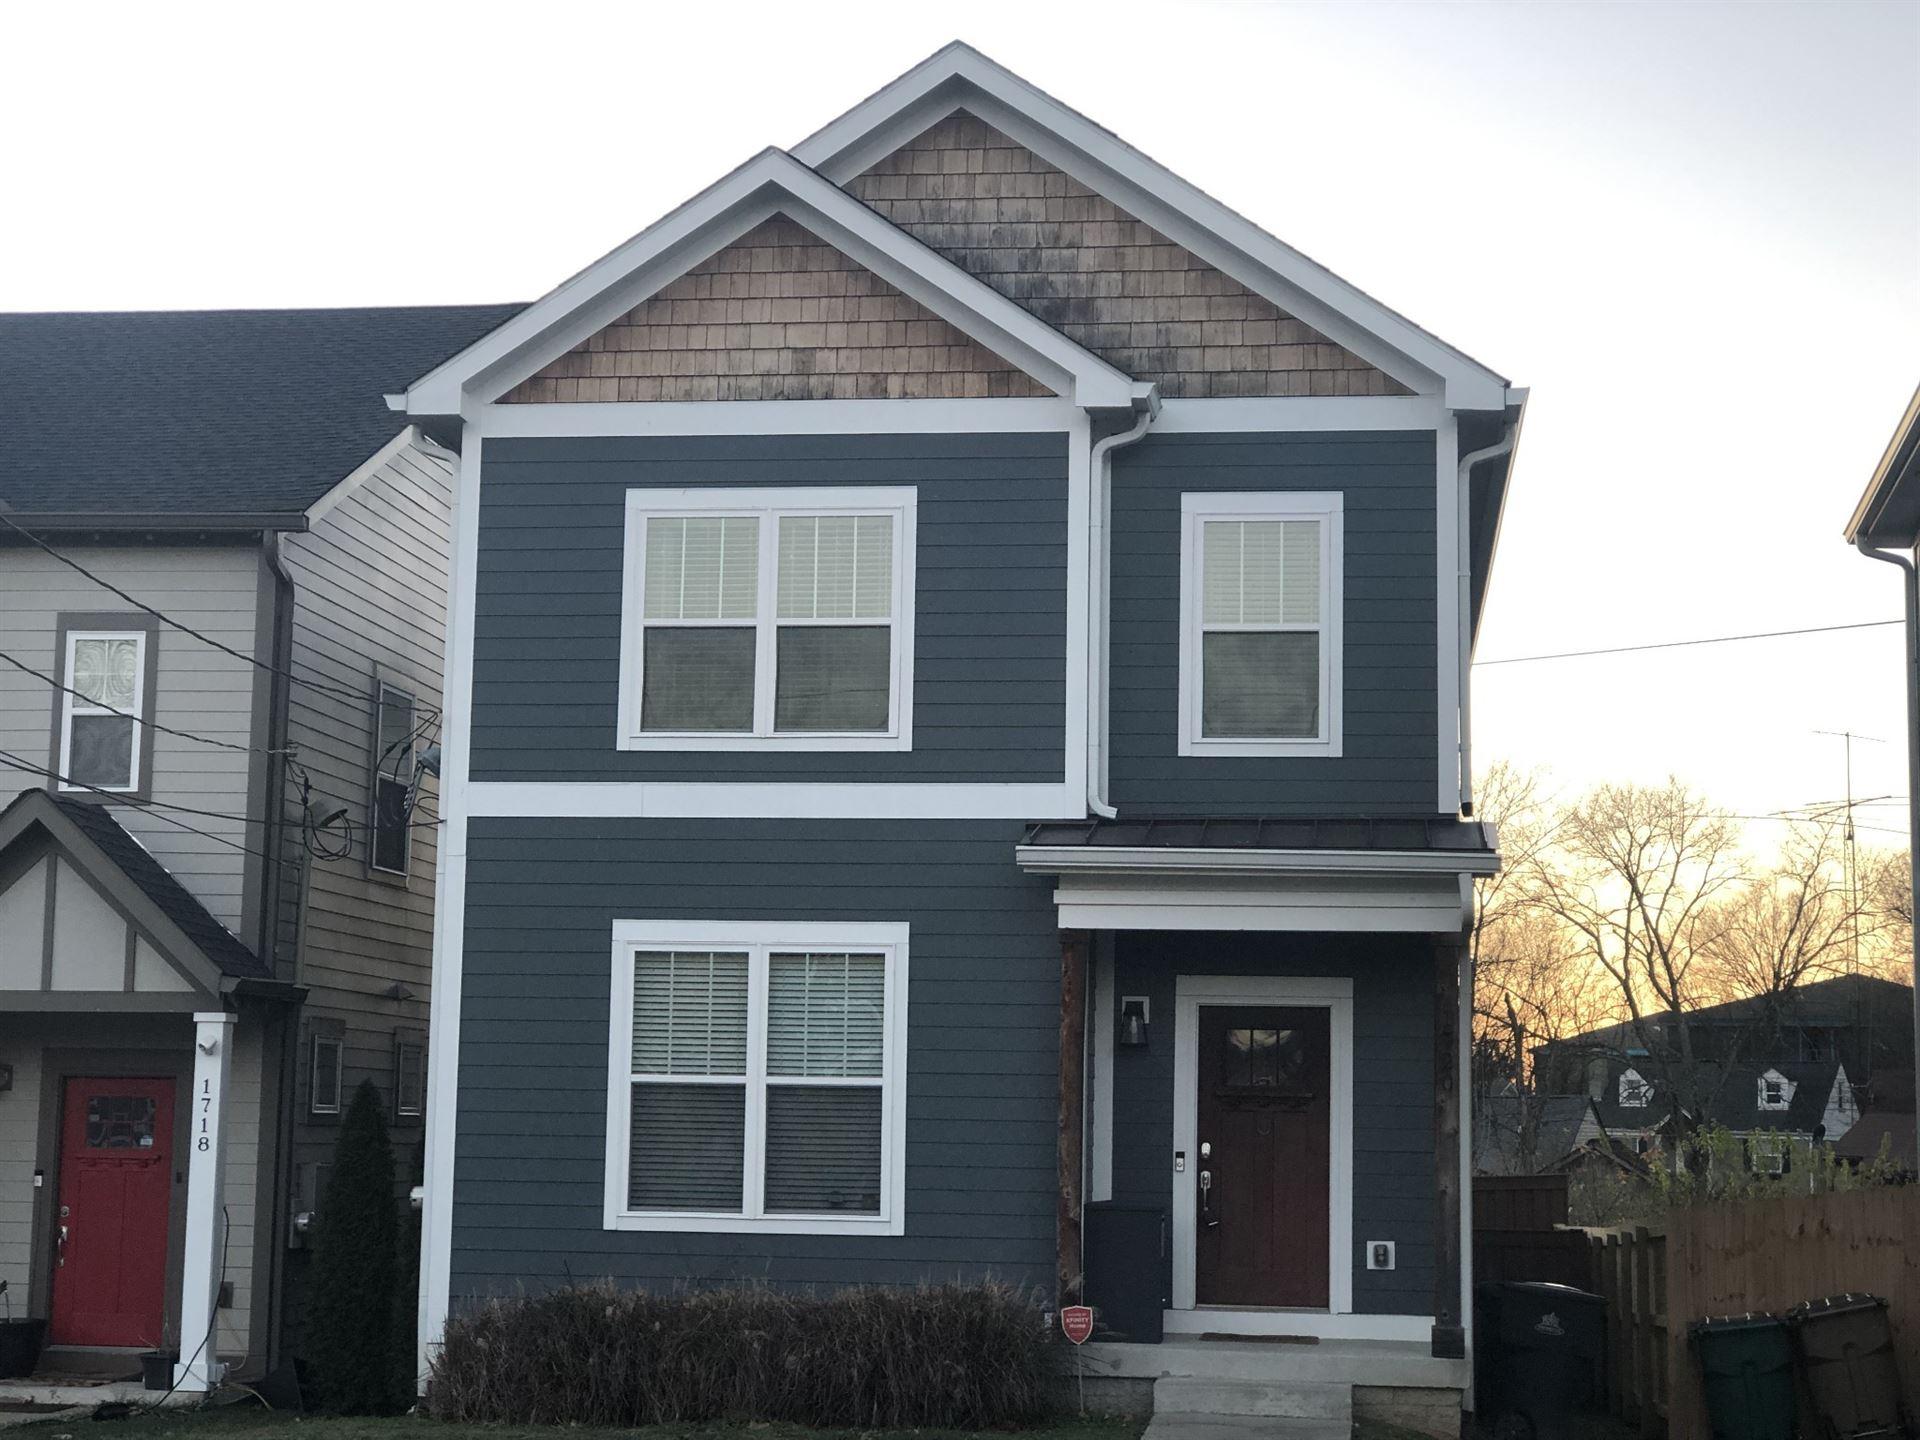 1720 Northview Ave, Nashville, TN 37216 - MLS#: 2242171